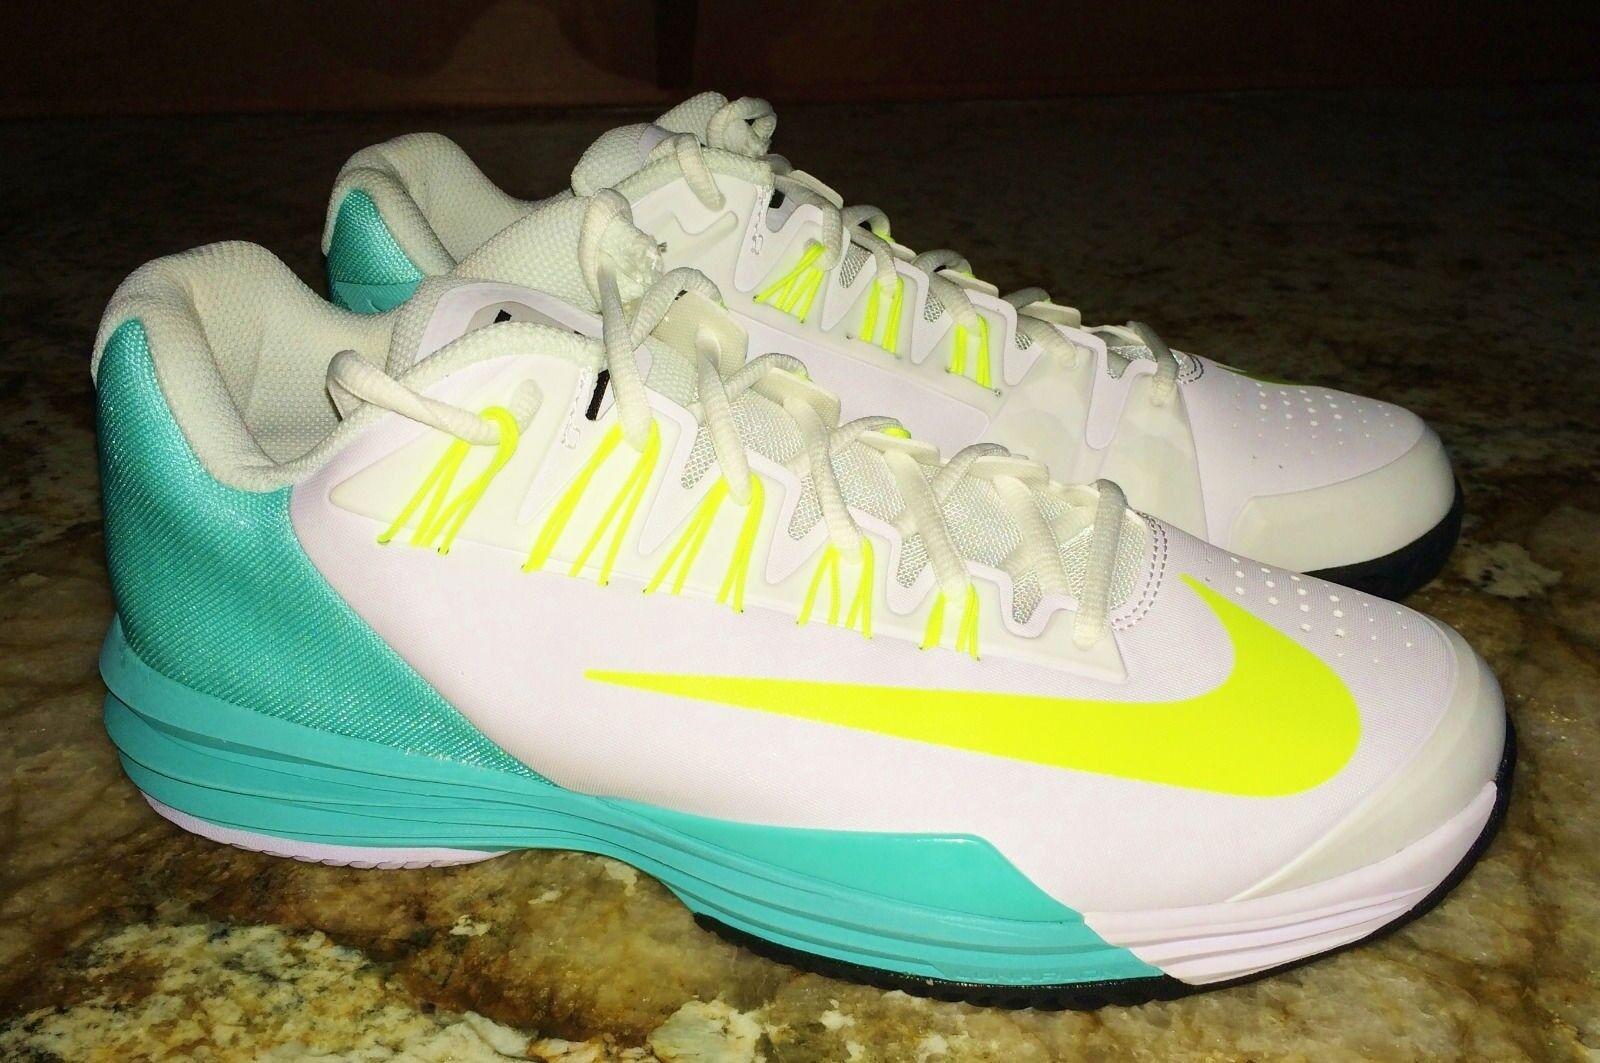 NIKE Lunar Ballistec White Volt Volt Volt Hyper Turquoise Tennis shoes NEW Womens Sz 11.5 0ae173